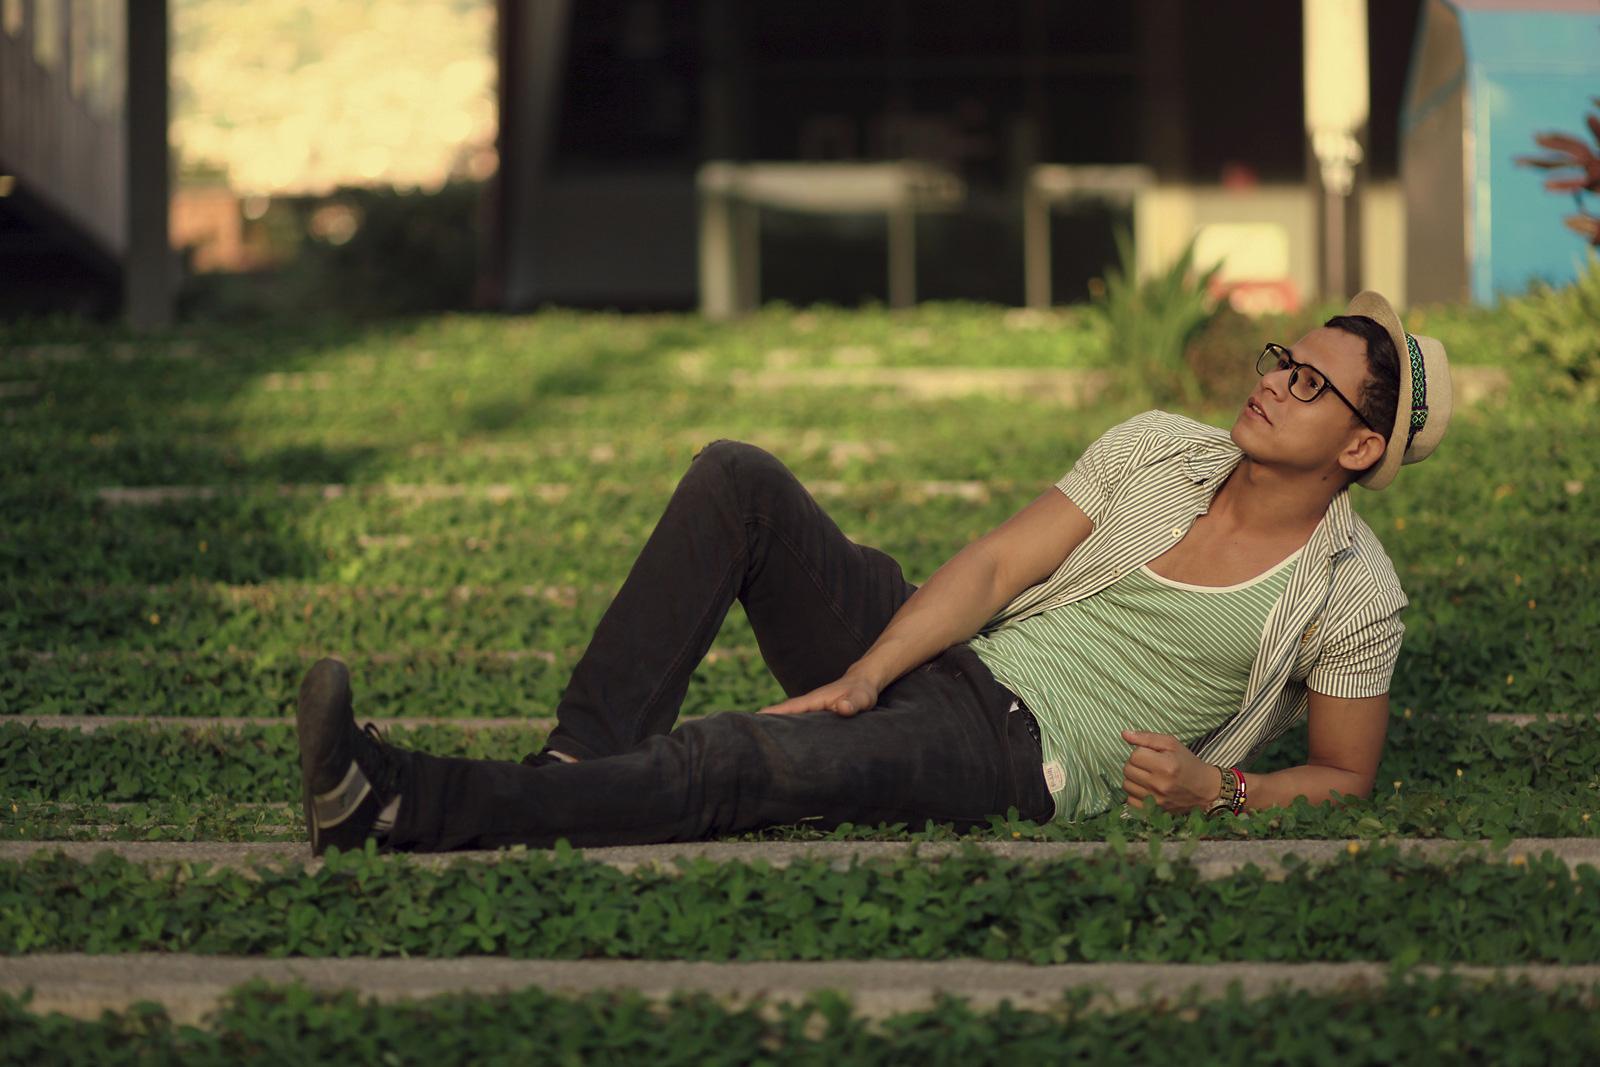 Paul-Culver-Photography-029.jpg